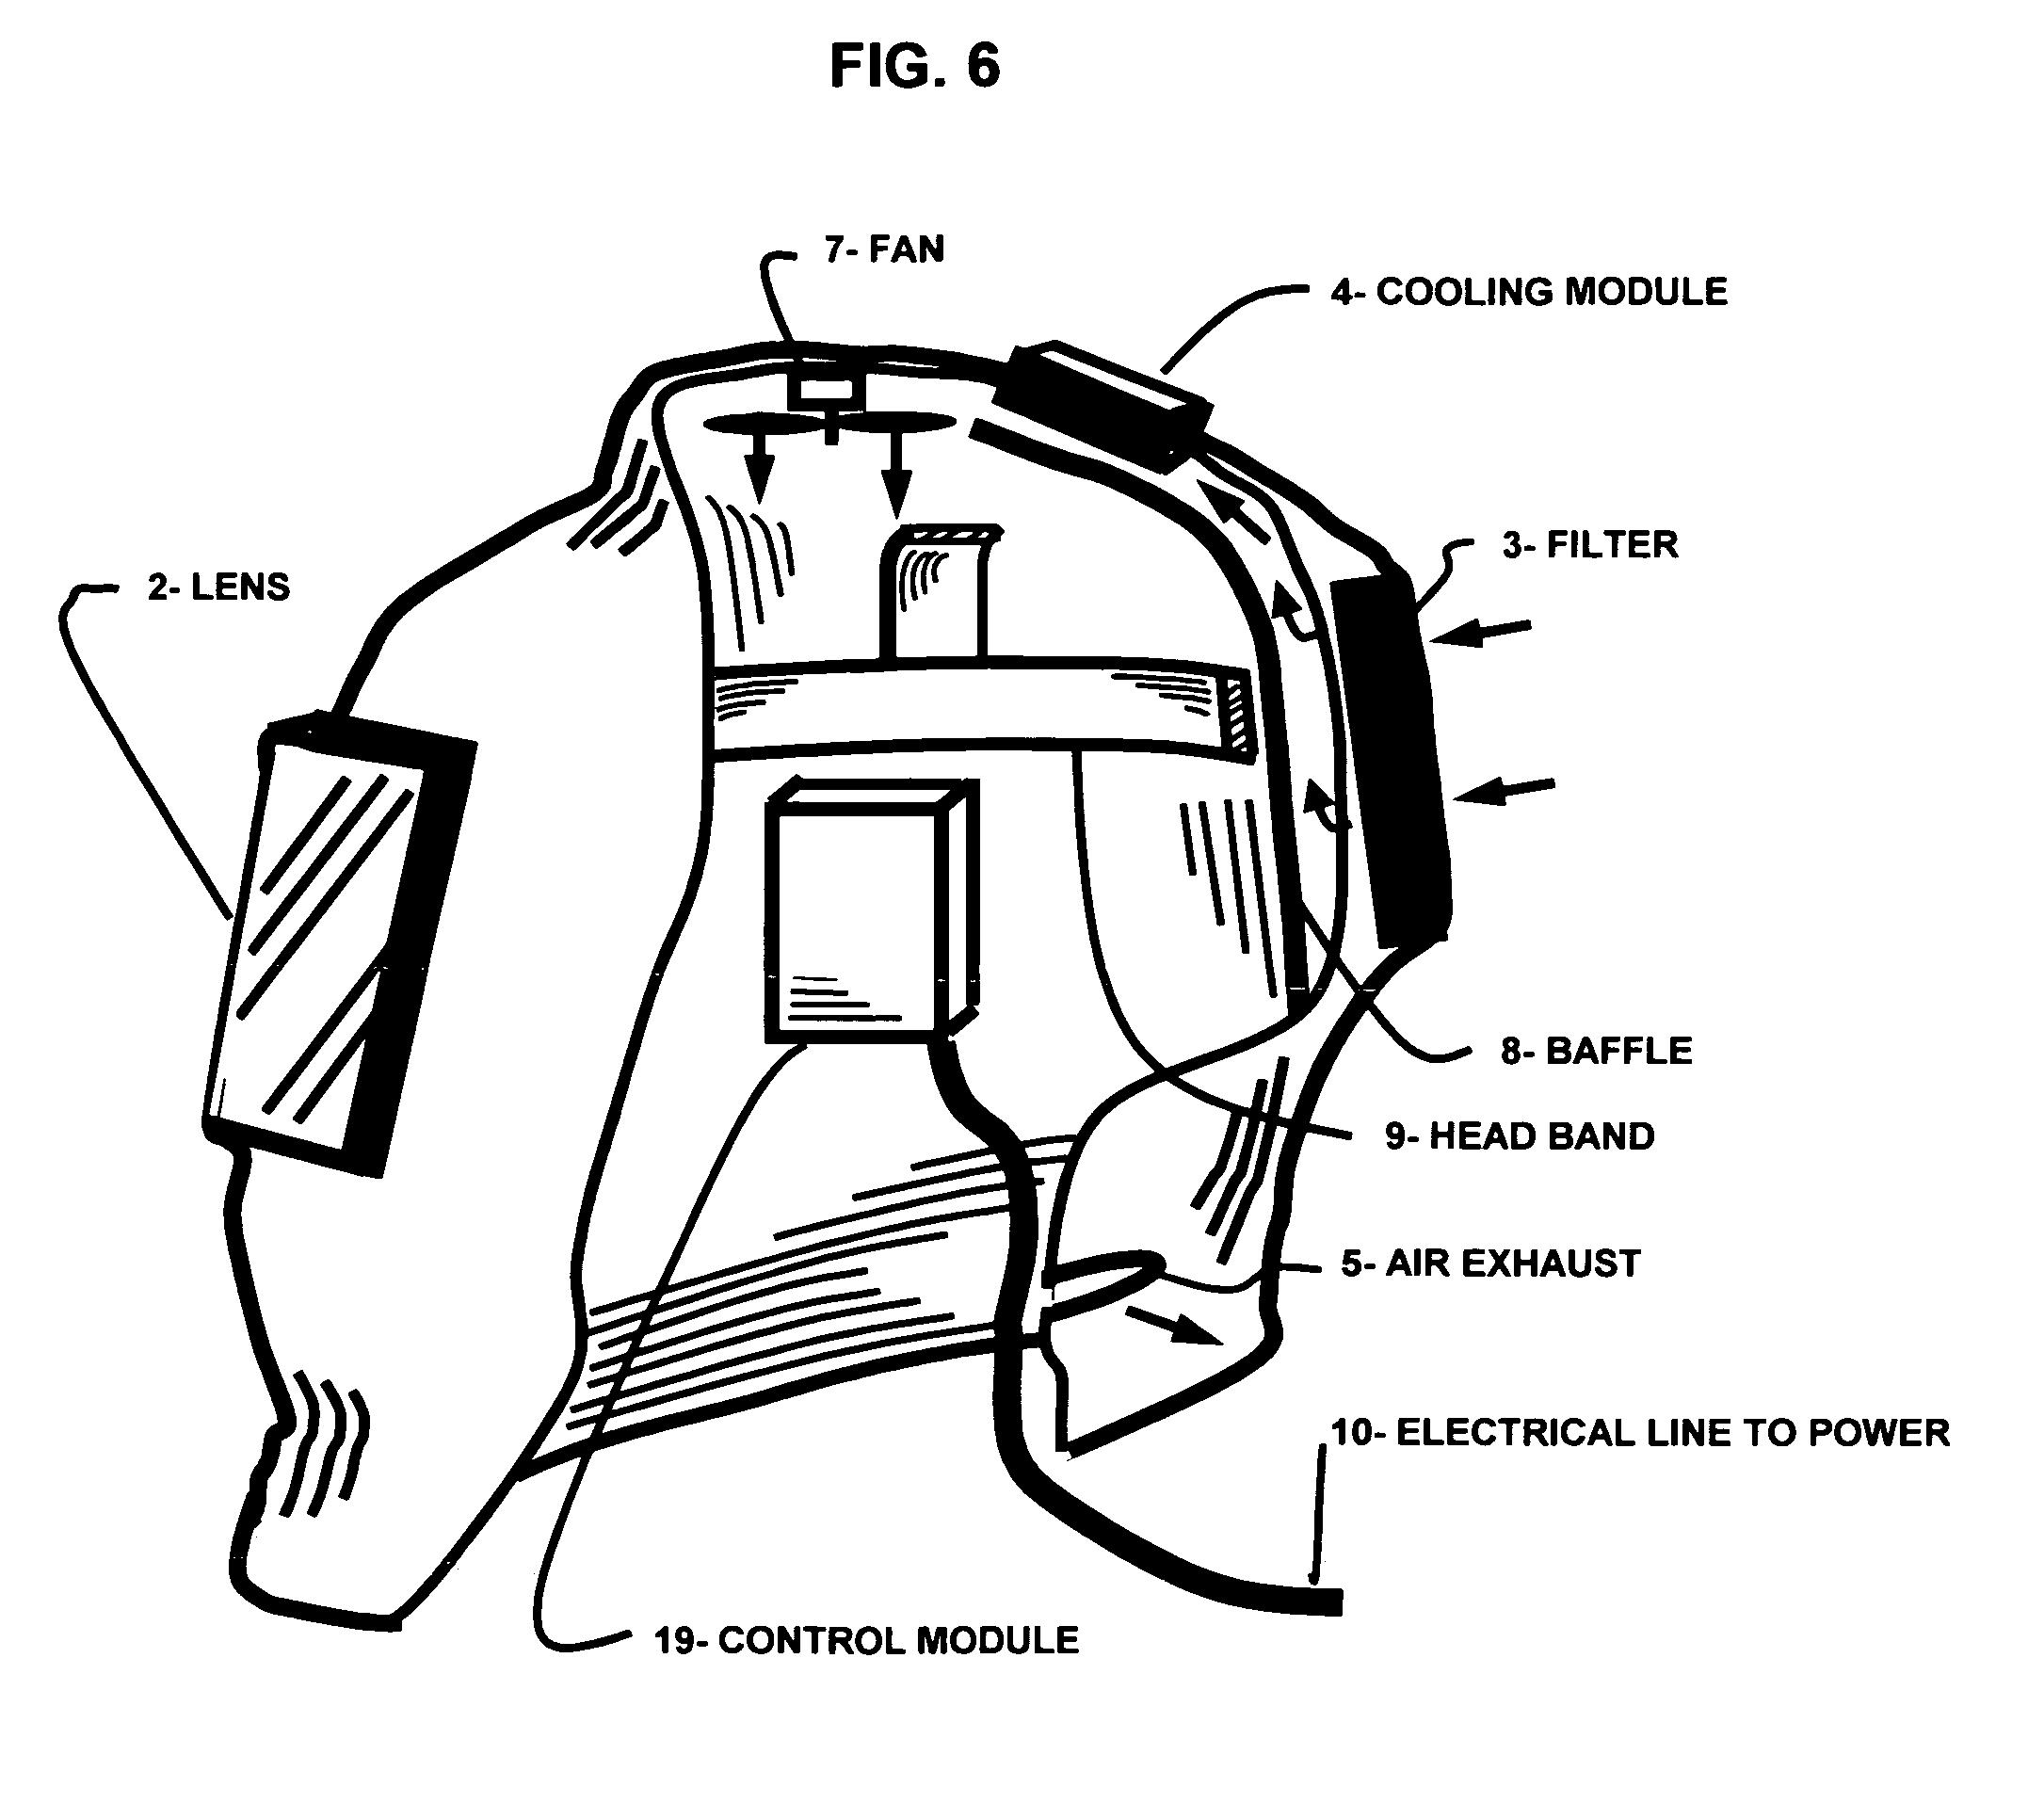 Welding Shield Diagram Schematics Wiring Diagrams A Circuit Of Torch Air Cooling Helmet Rh Aircoolingpatariko Blogspot Com Curtains